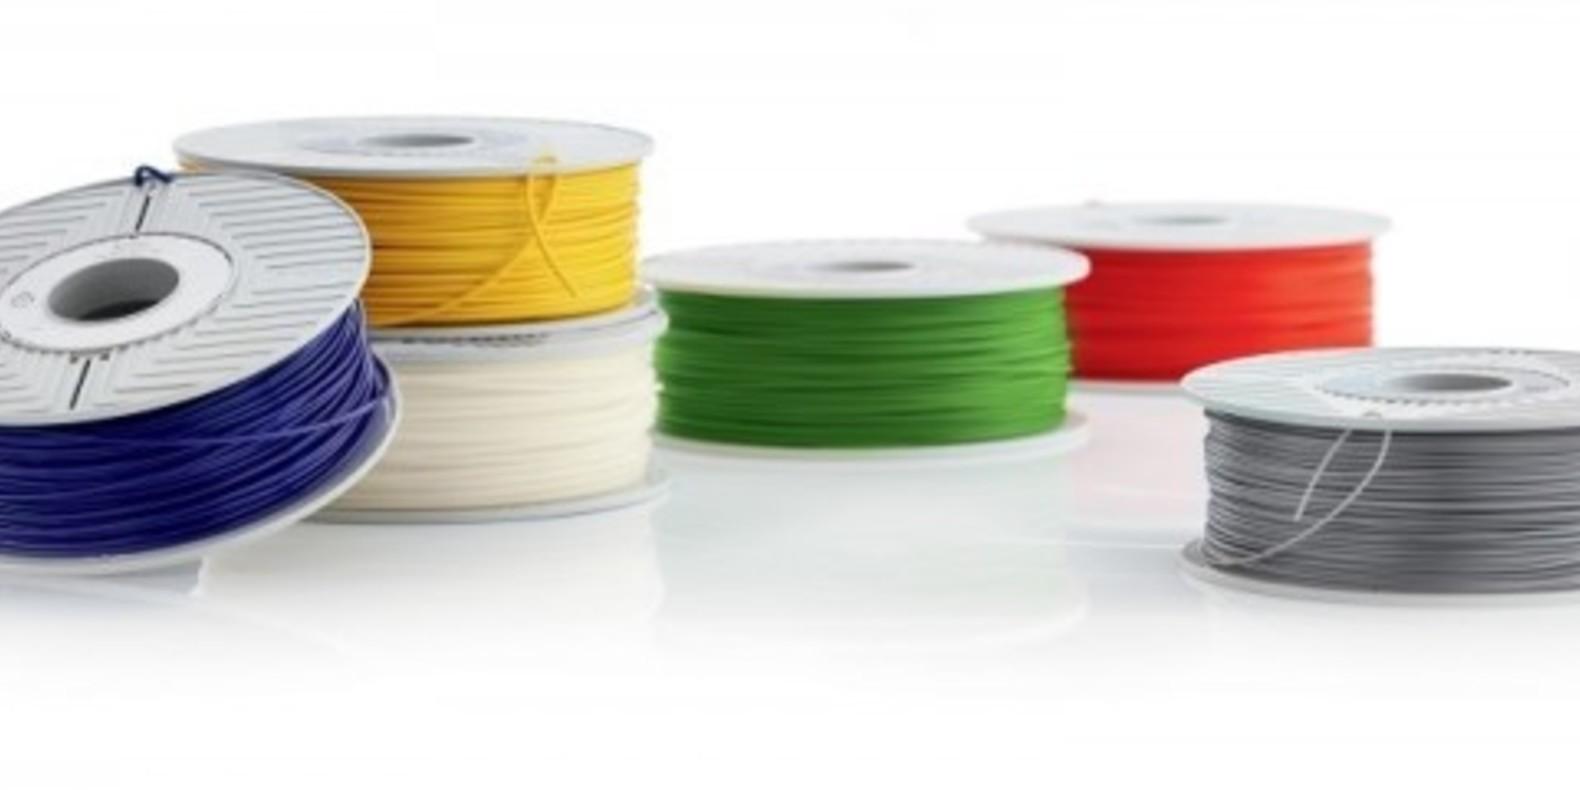 http://fichier3d.fr/wp-content/uploads/2016/02/filament_lined_up.jpg